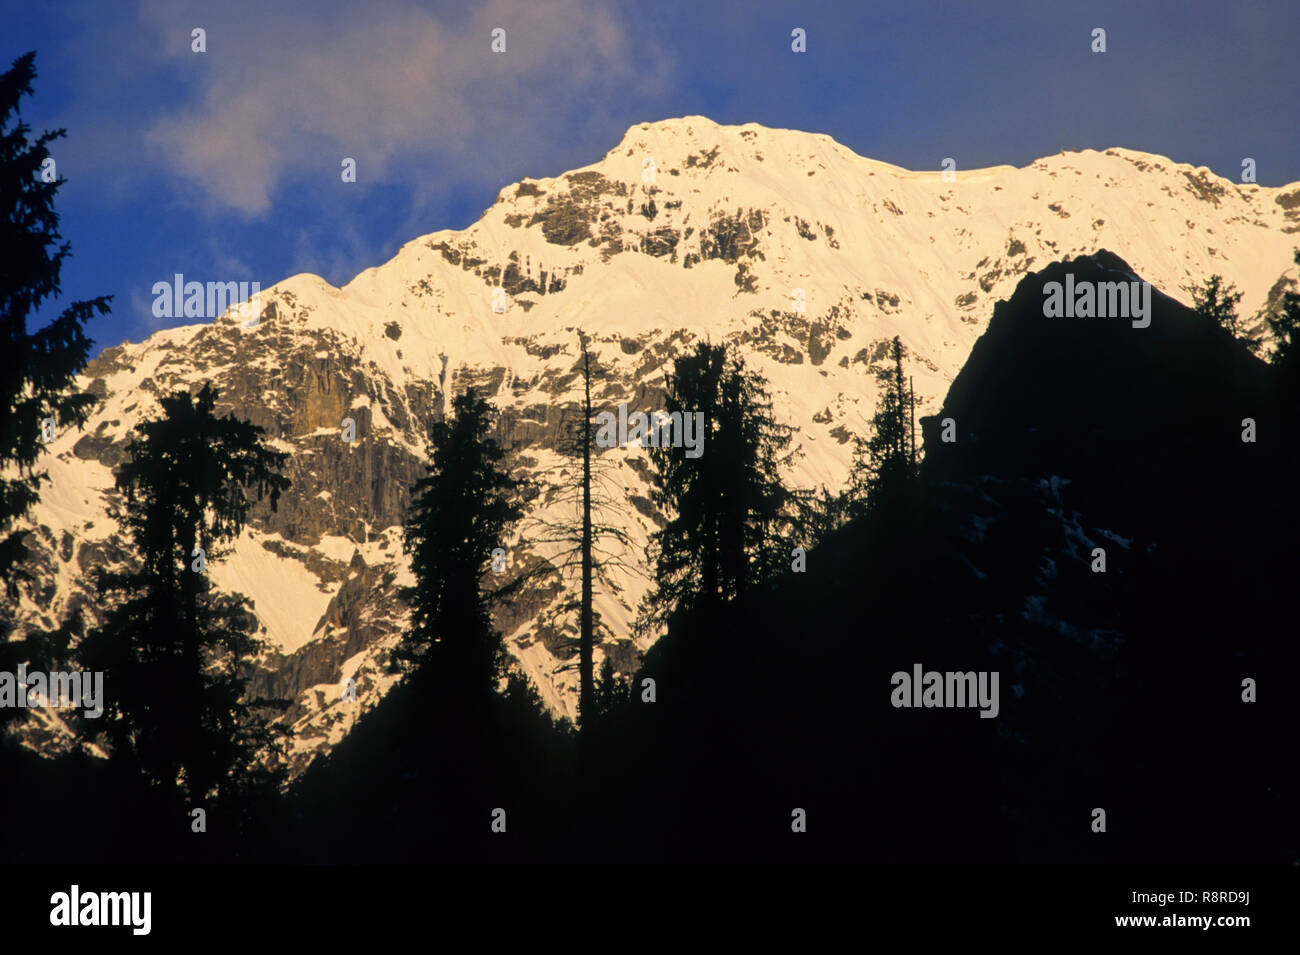 Mountain peaks at Solang, Manali, Himachal Pradesh, India - Stock Image